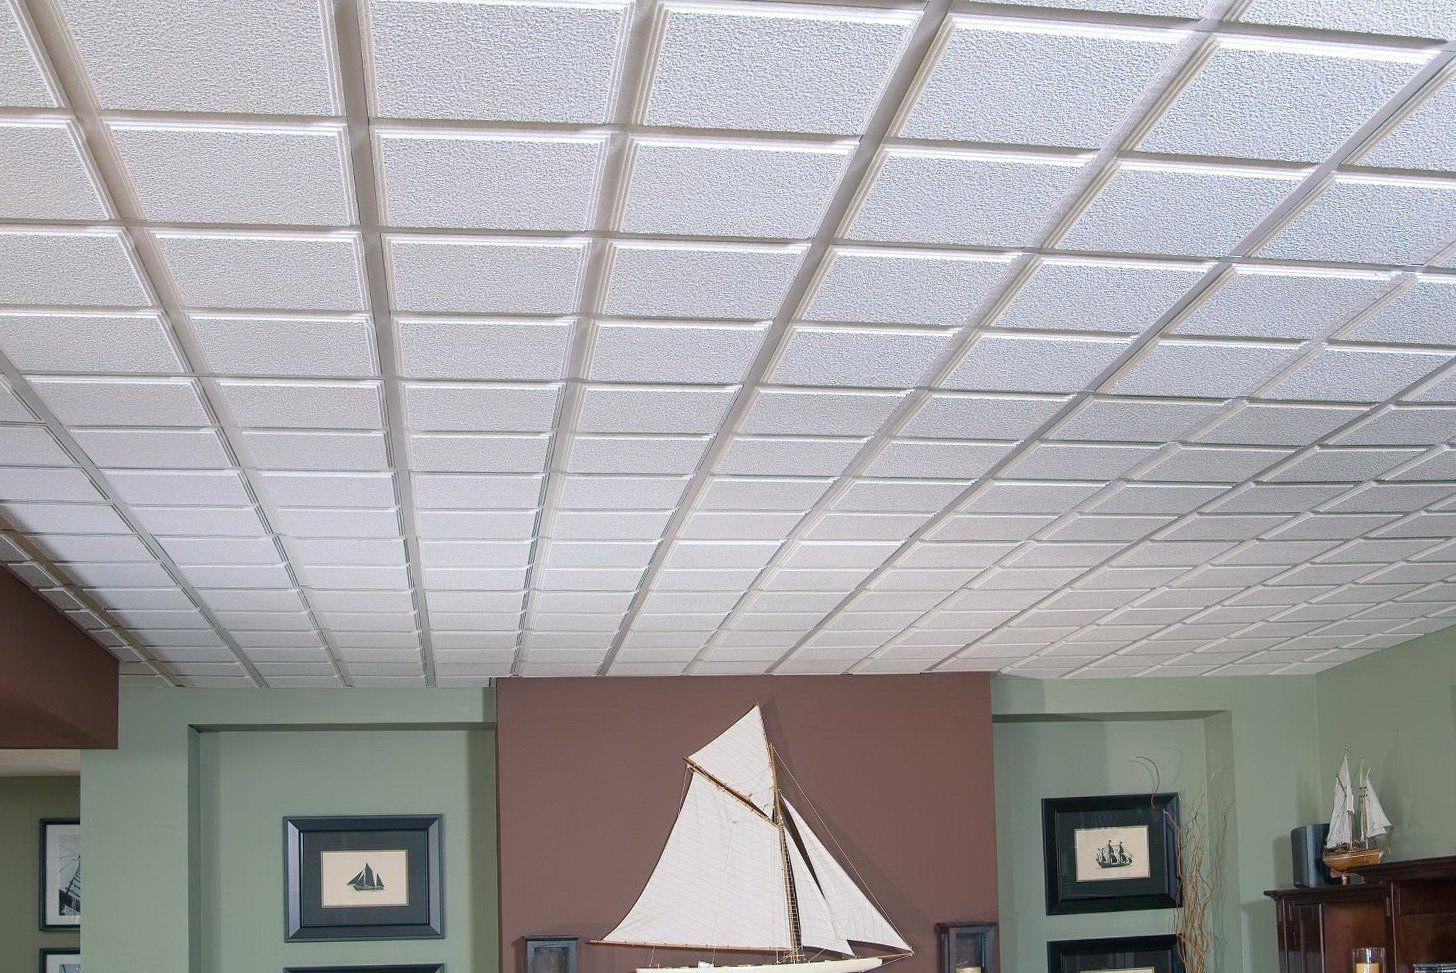 Armstrong Ceiling Tiles 22 1774 Conforto Acustico Conforto